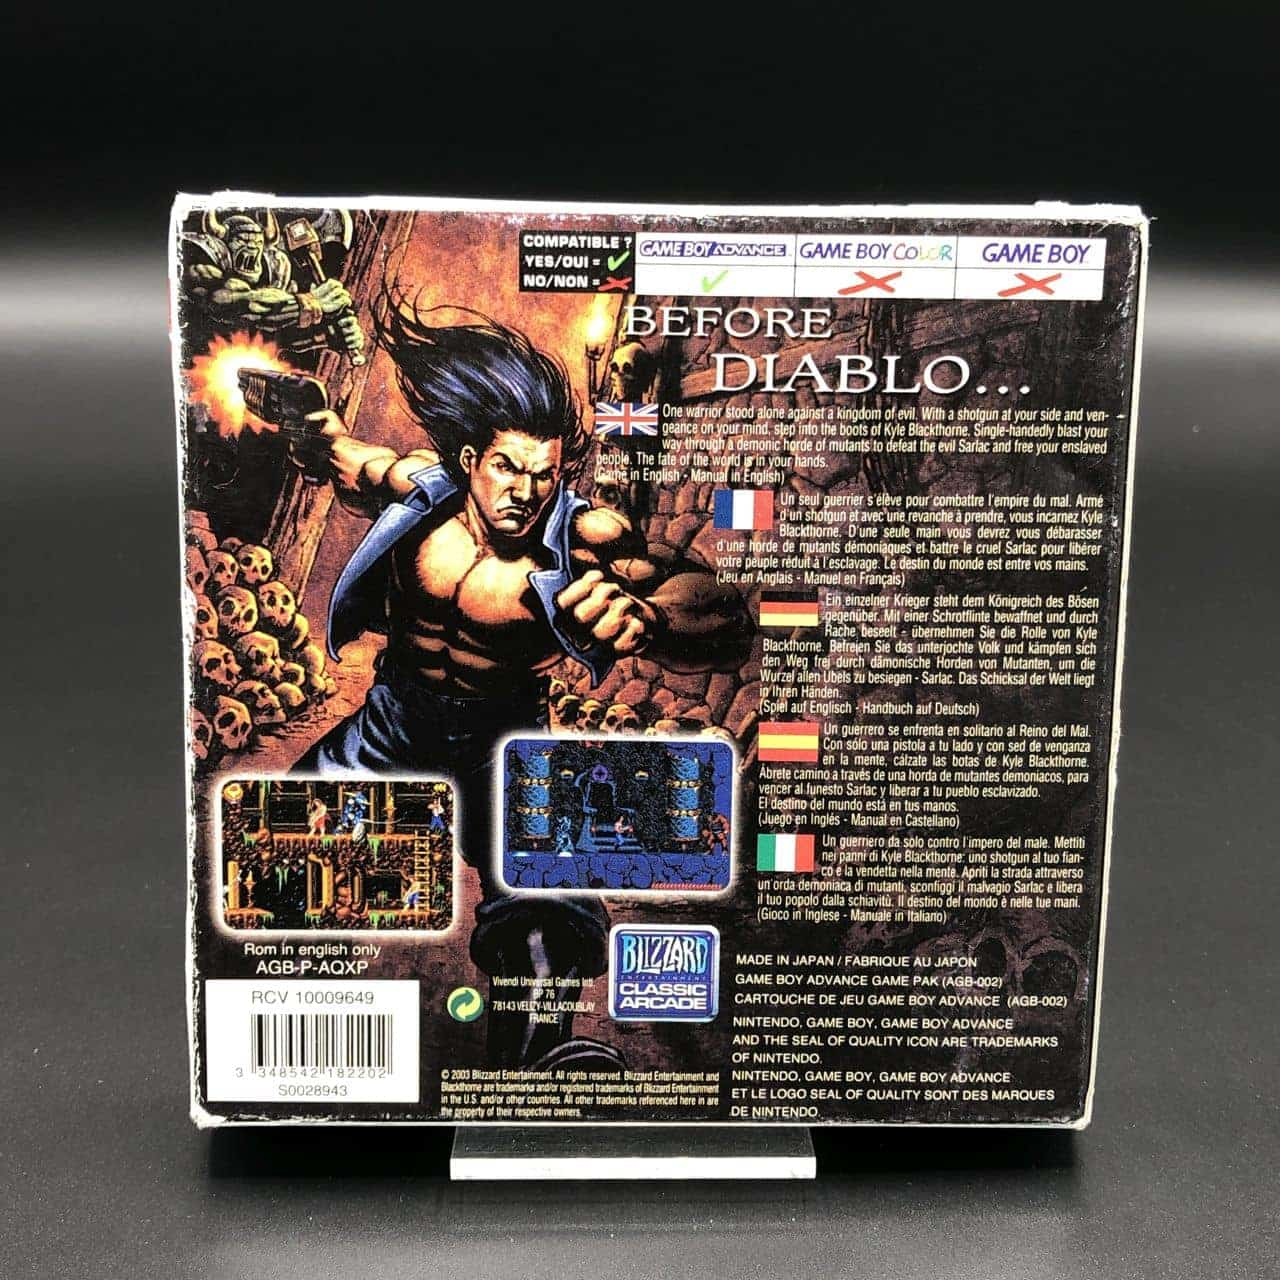 GBA Blackthorne (Komplett) (Gut) Nintendo Game Boy Advance